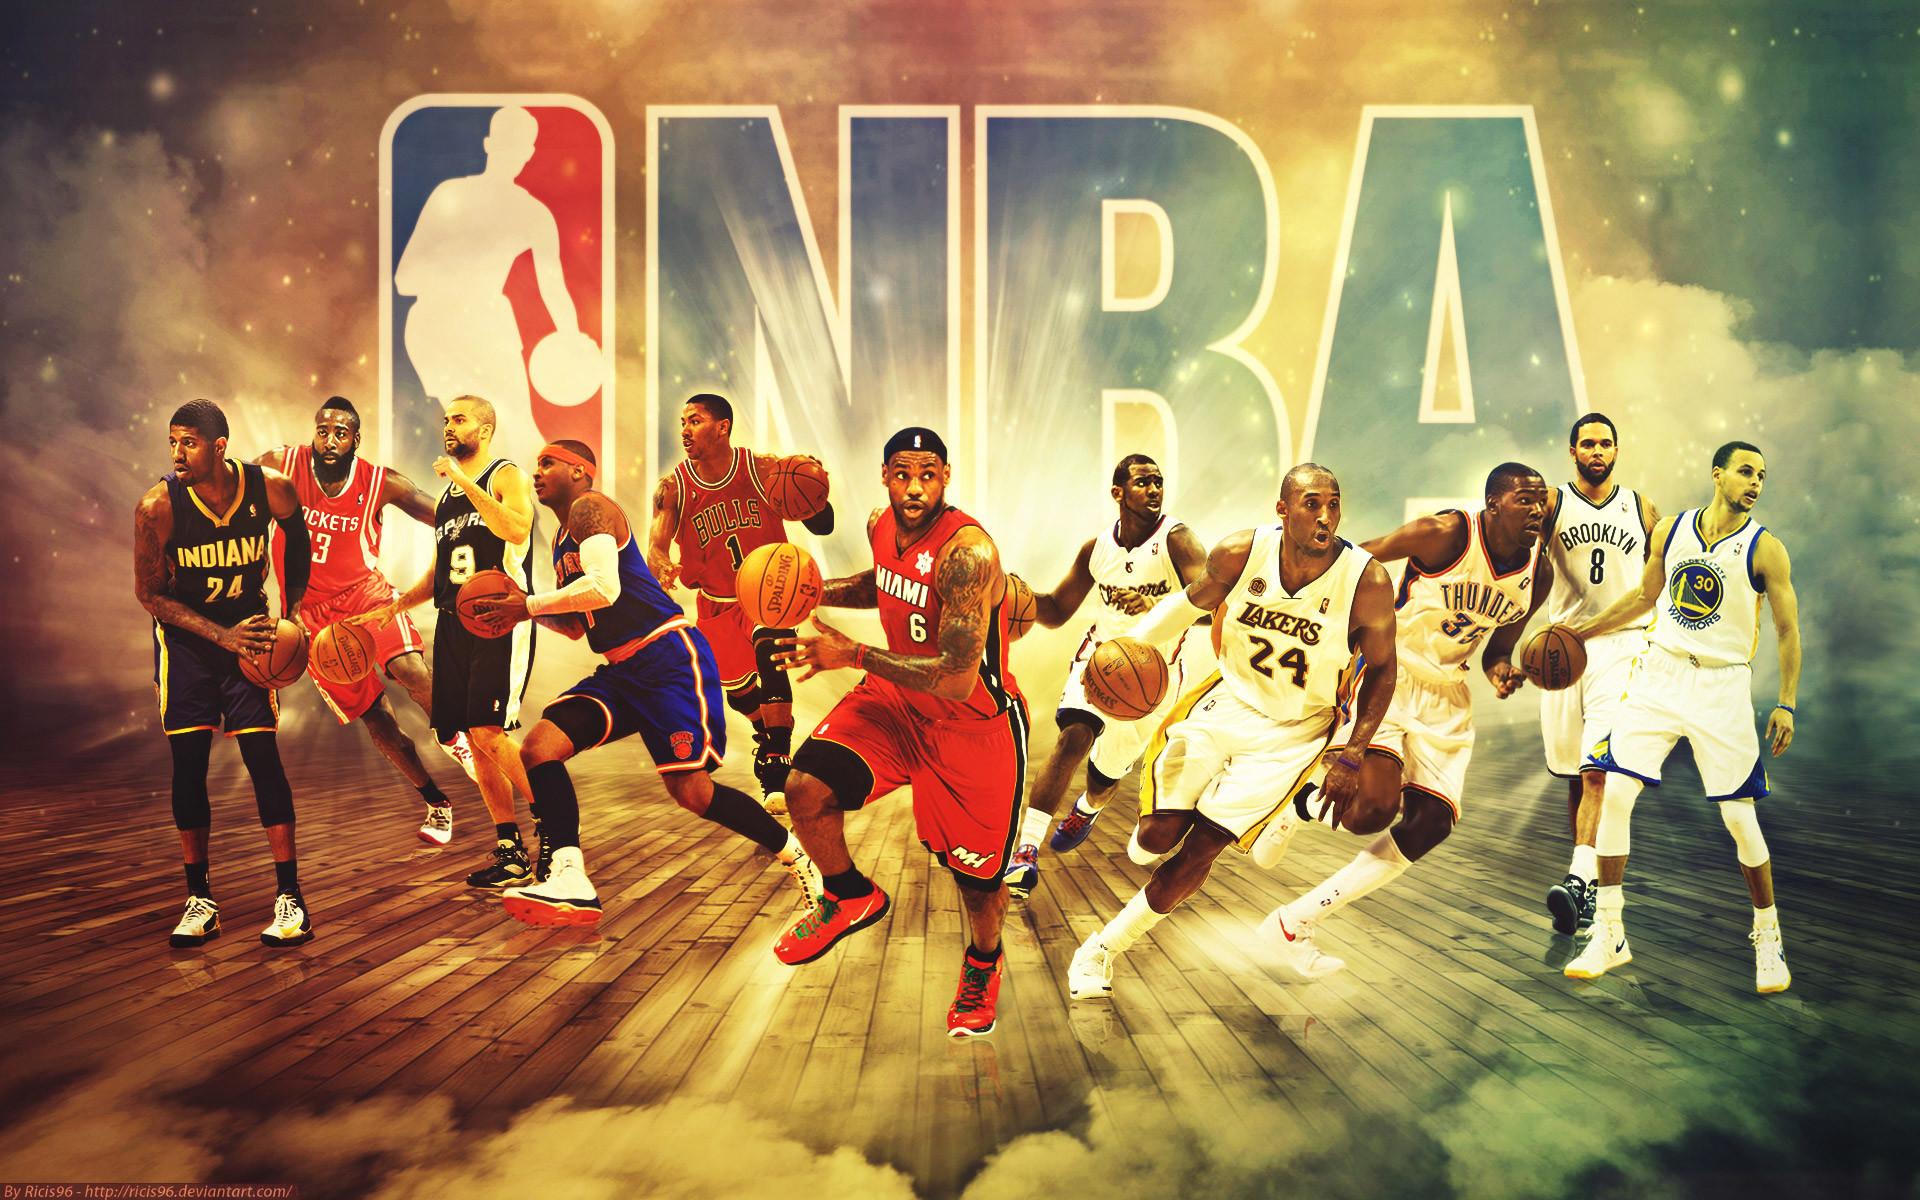 nba stars nba team wallpaper share this cool nba basketball team .